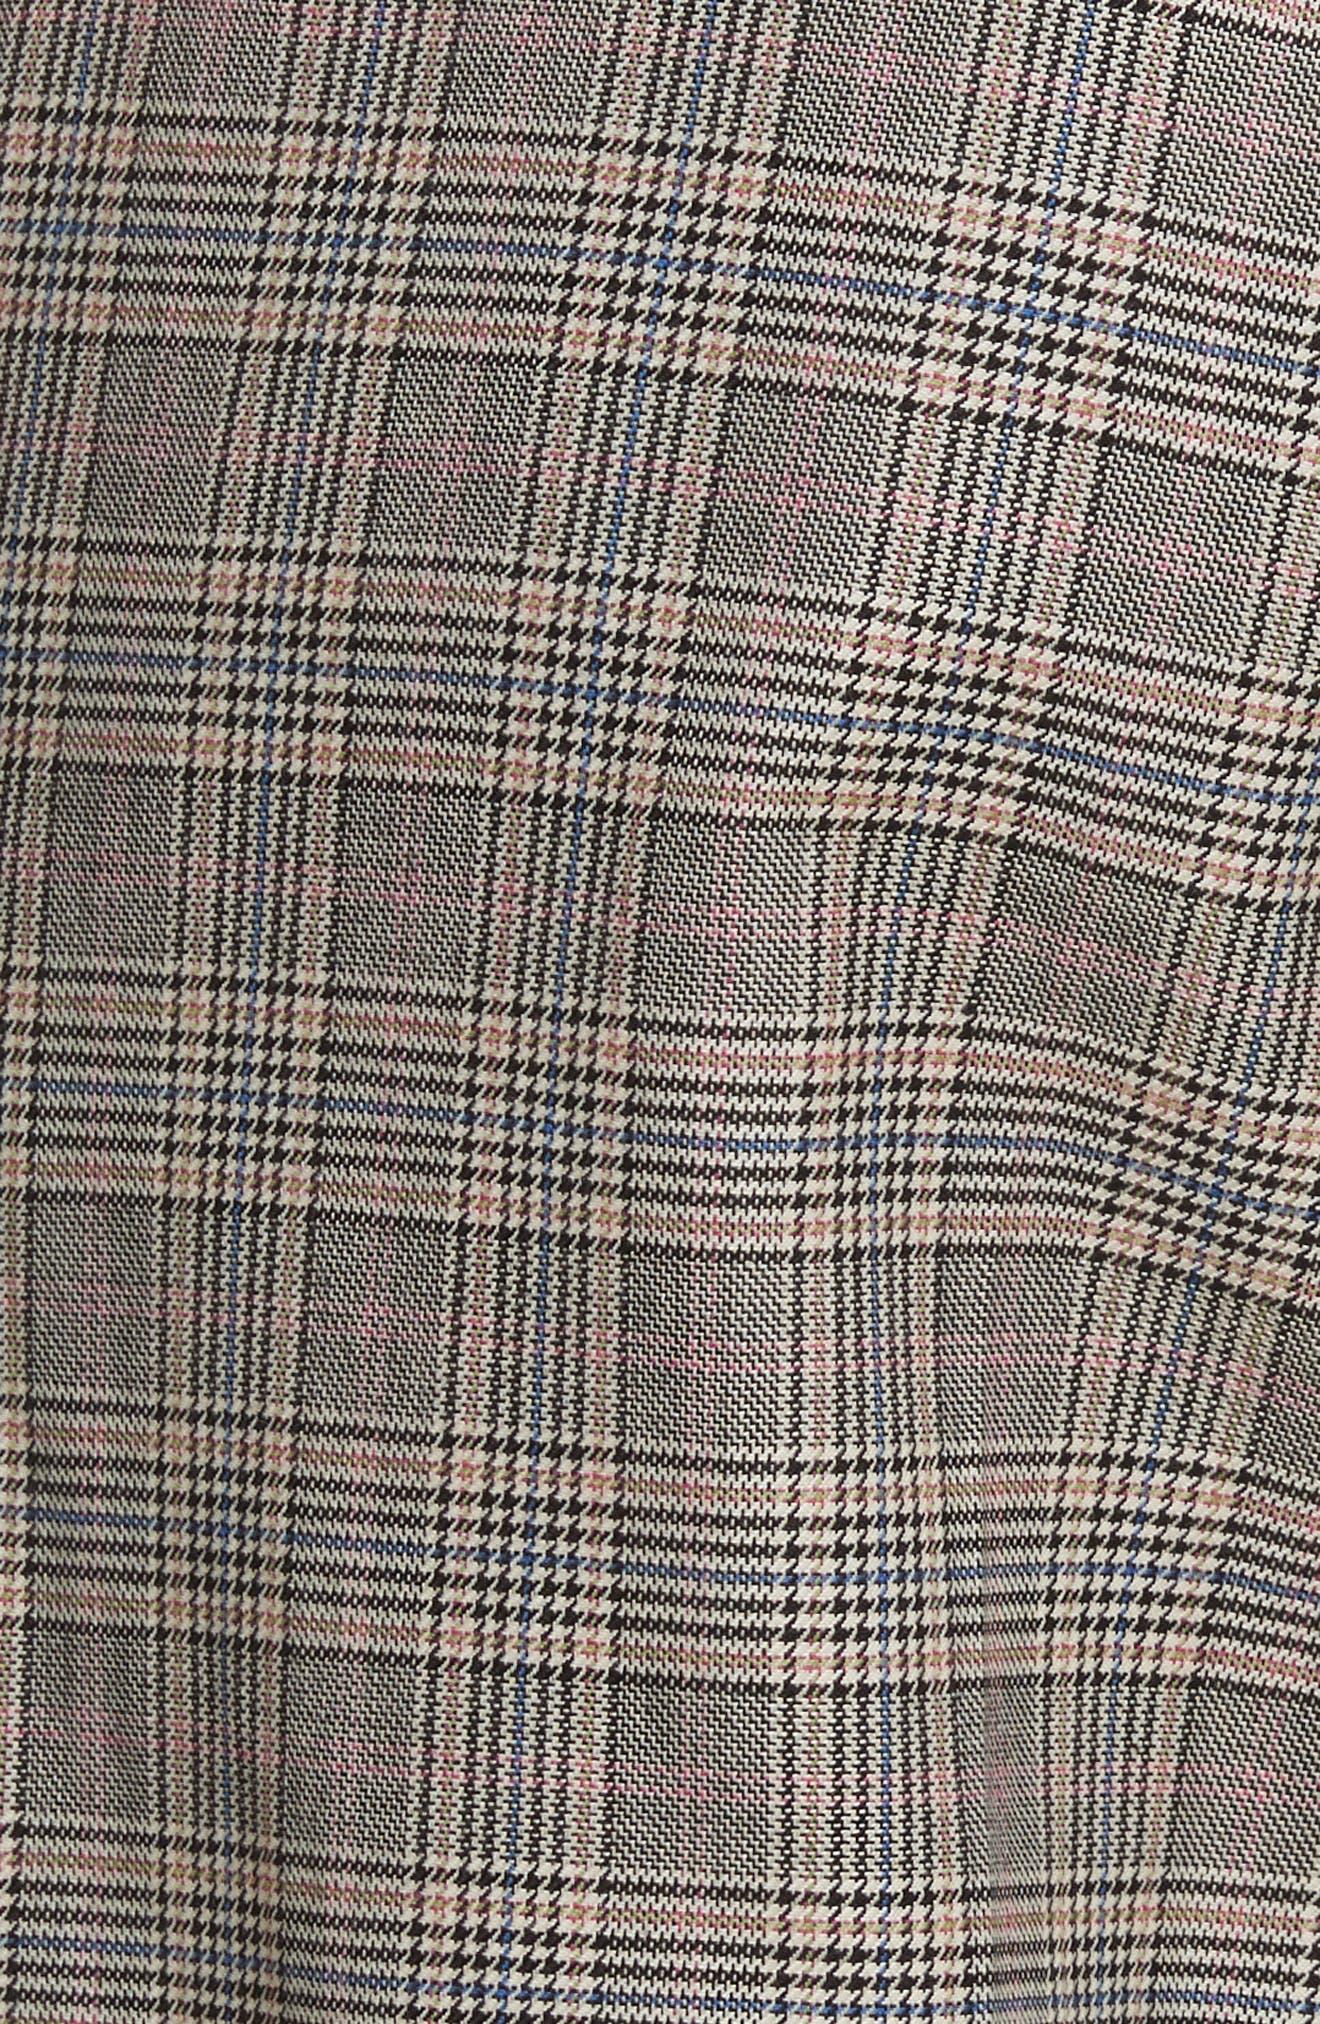 Oman Side Stripe Wool Blend Pants,                             Alternate thumbnail 5, color,                             017